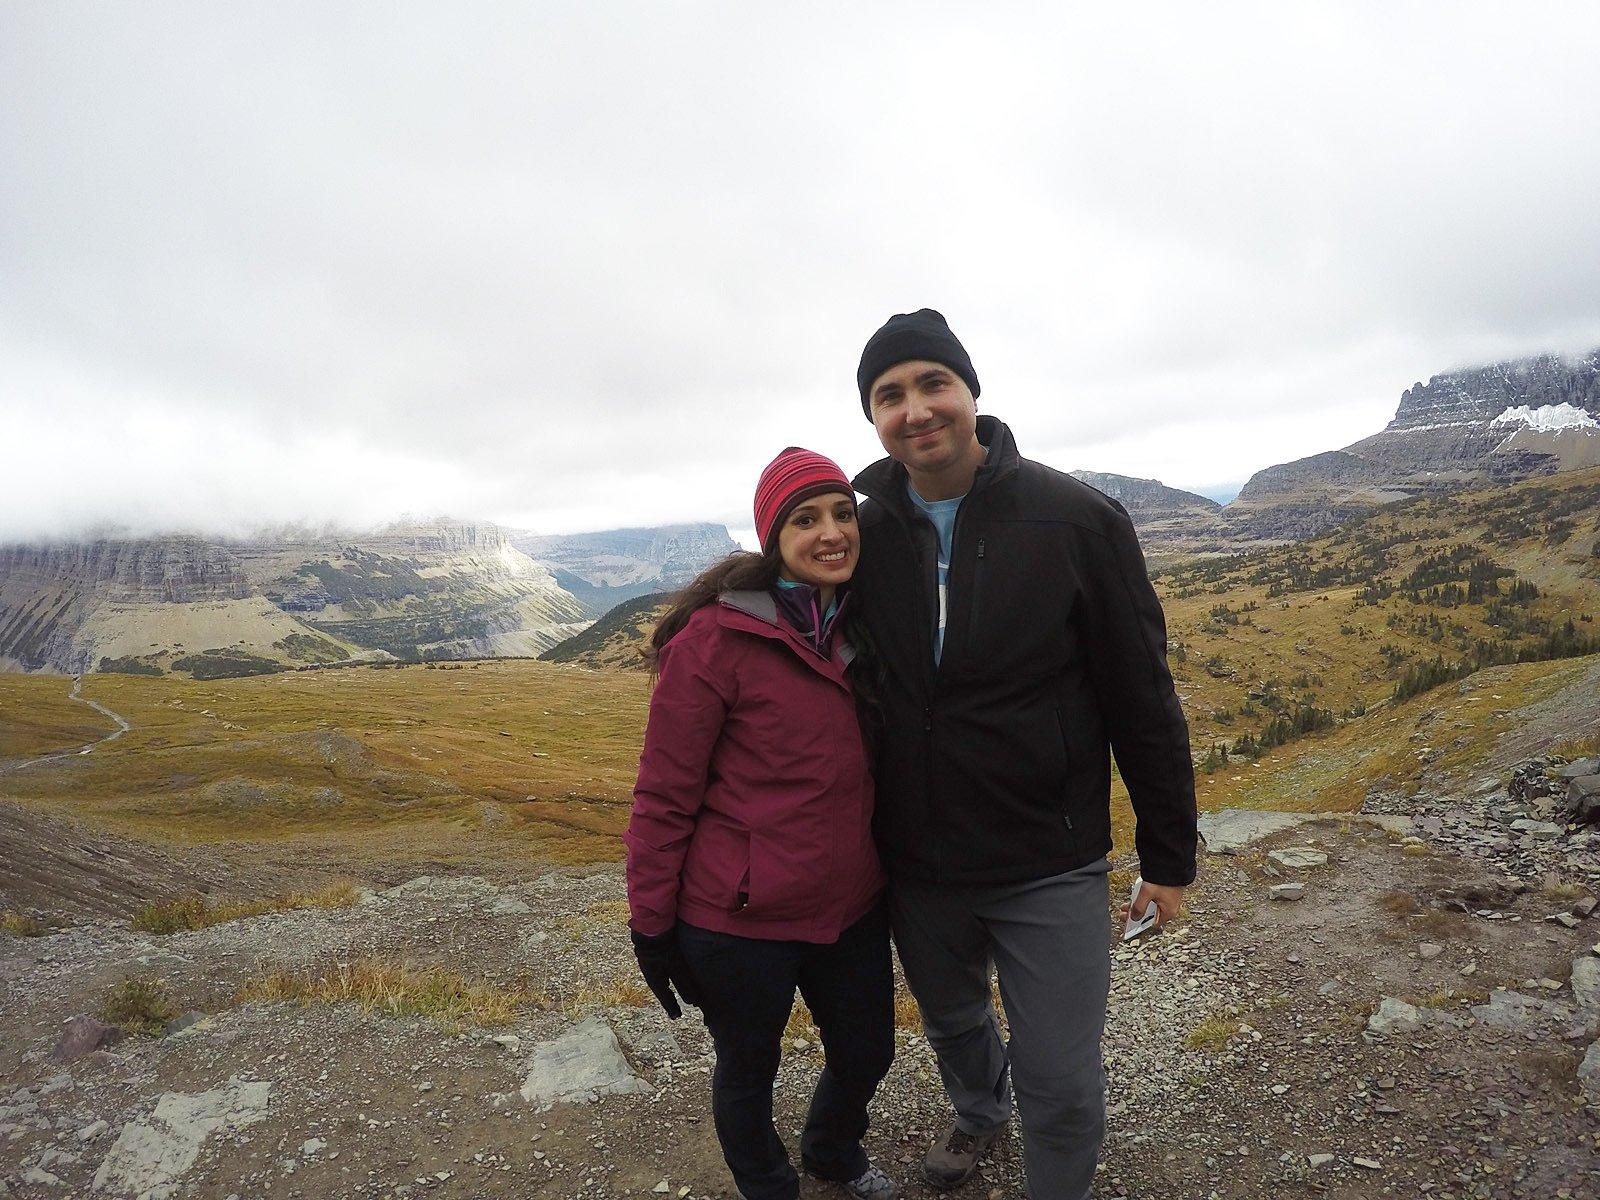 Logan Pass Trail to Hidden Lake